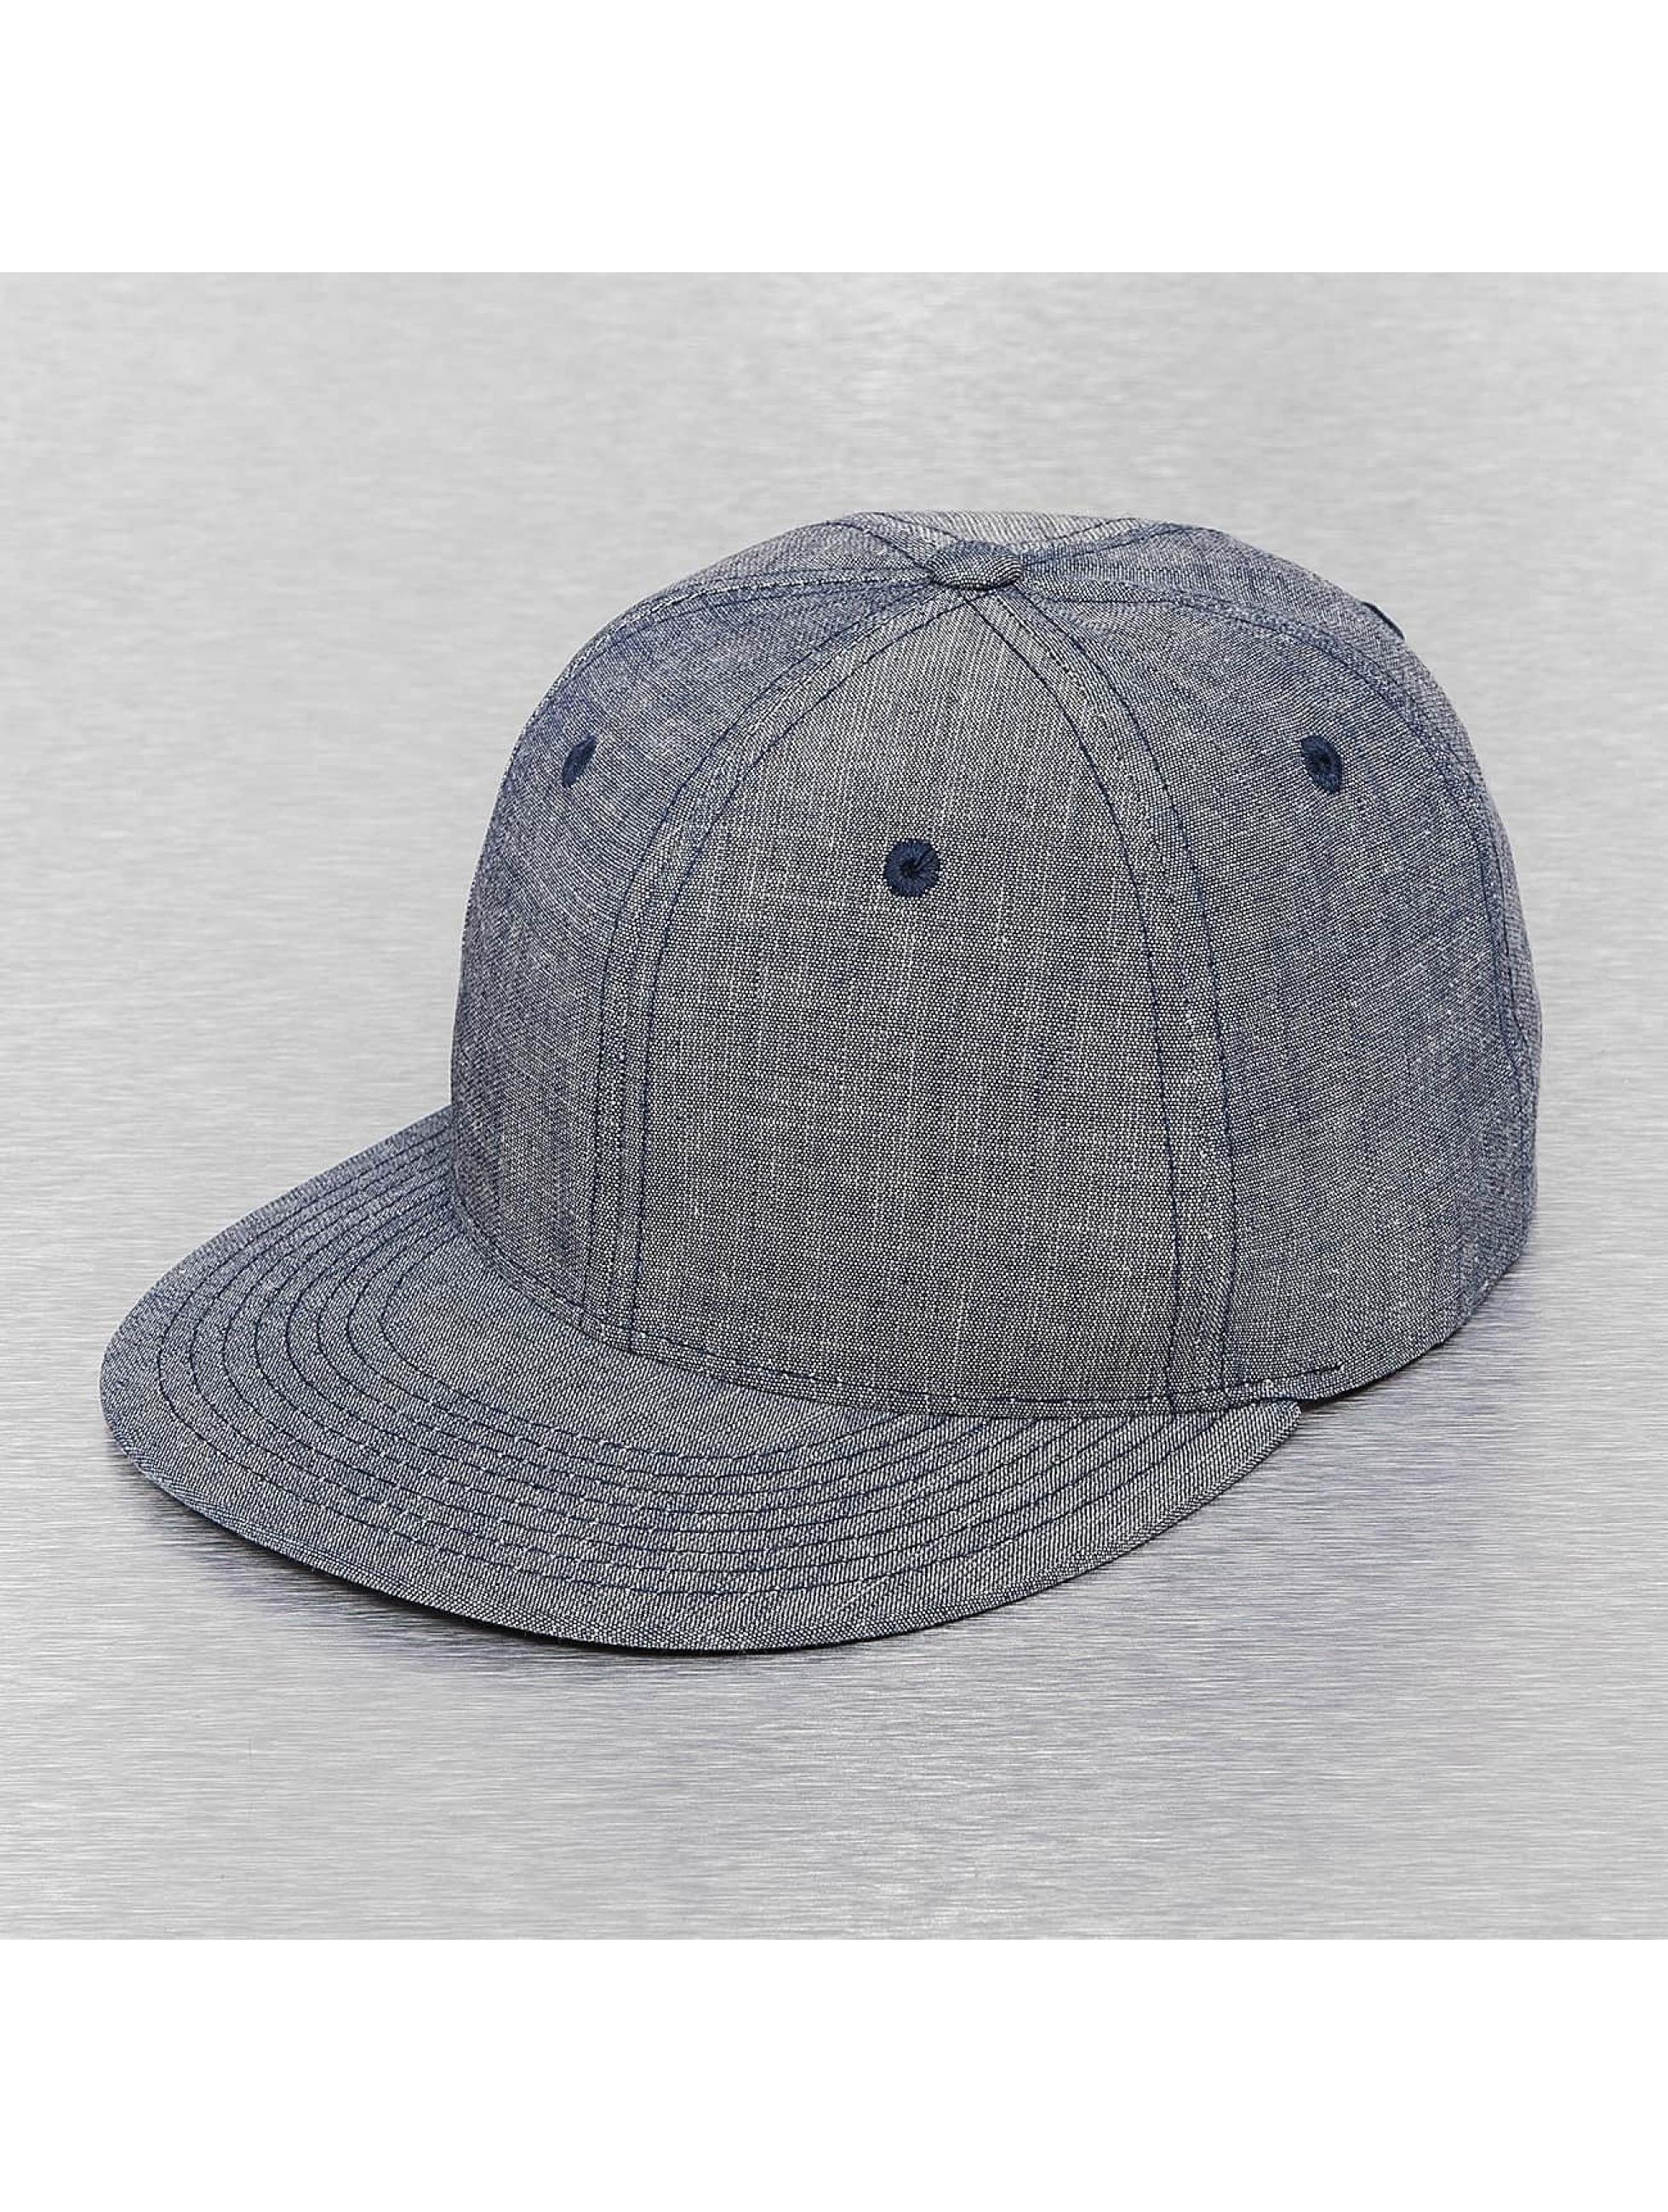 Cap Crony Кепка с застёжкой Washed Denim синий